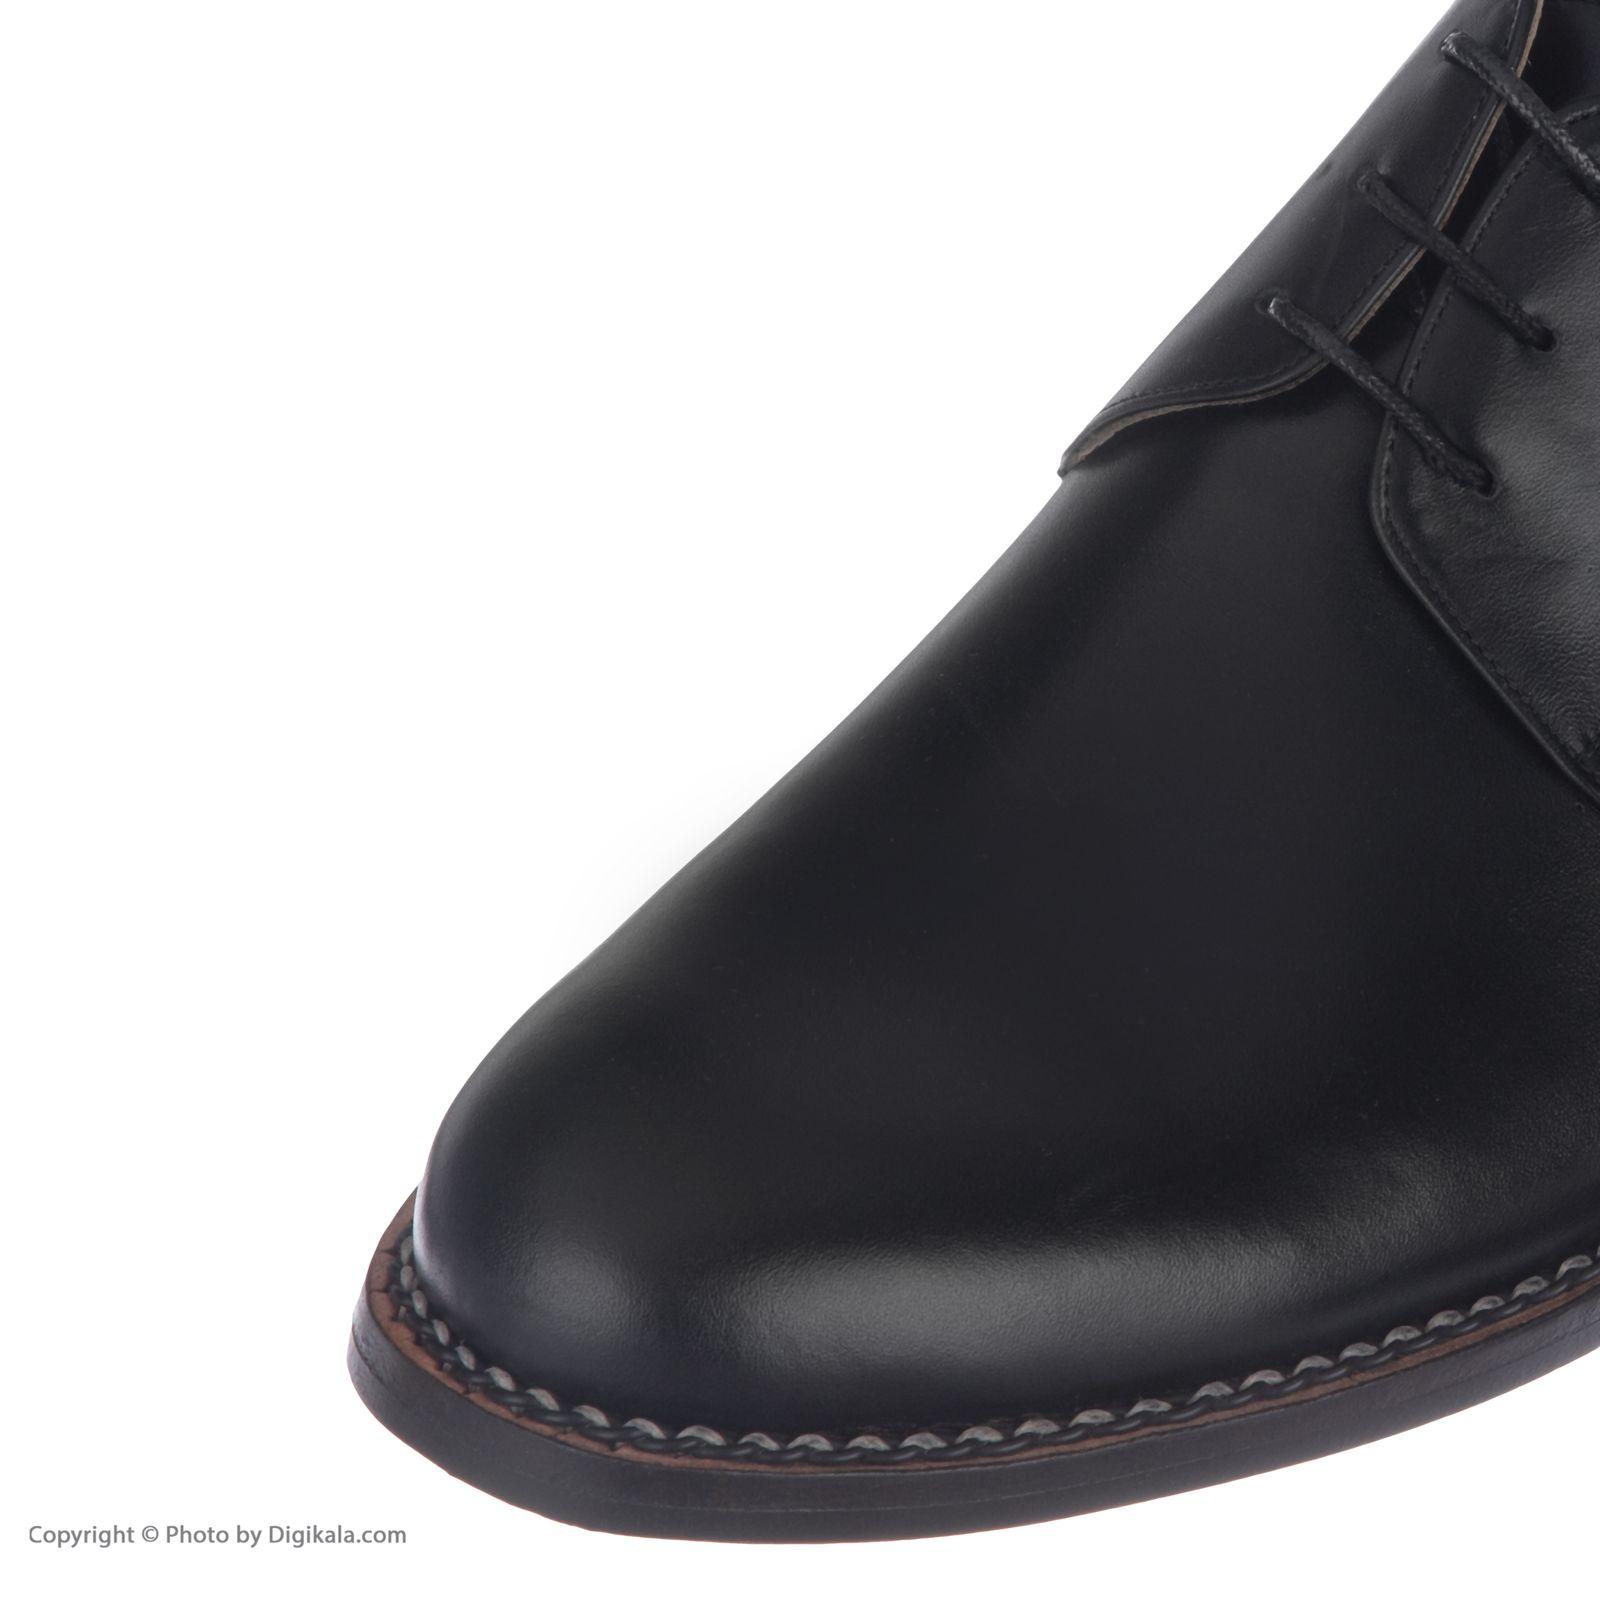 کفش مردانه نظری کد 405 -  - 6